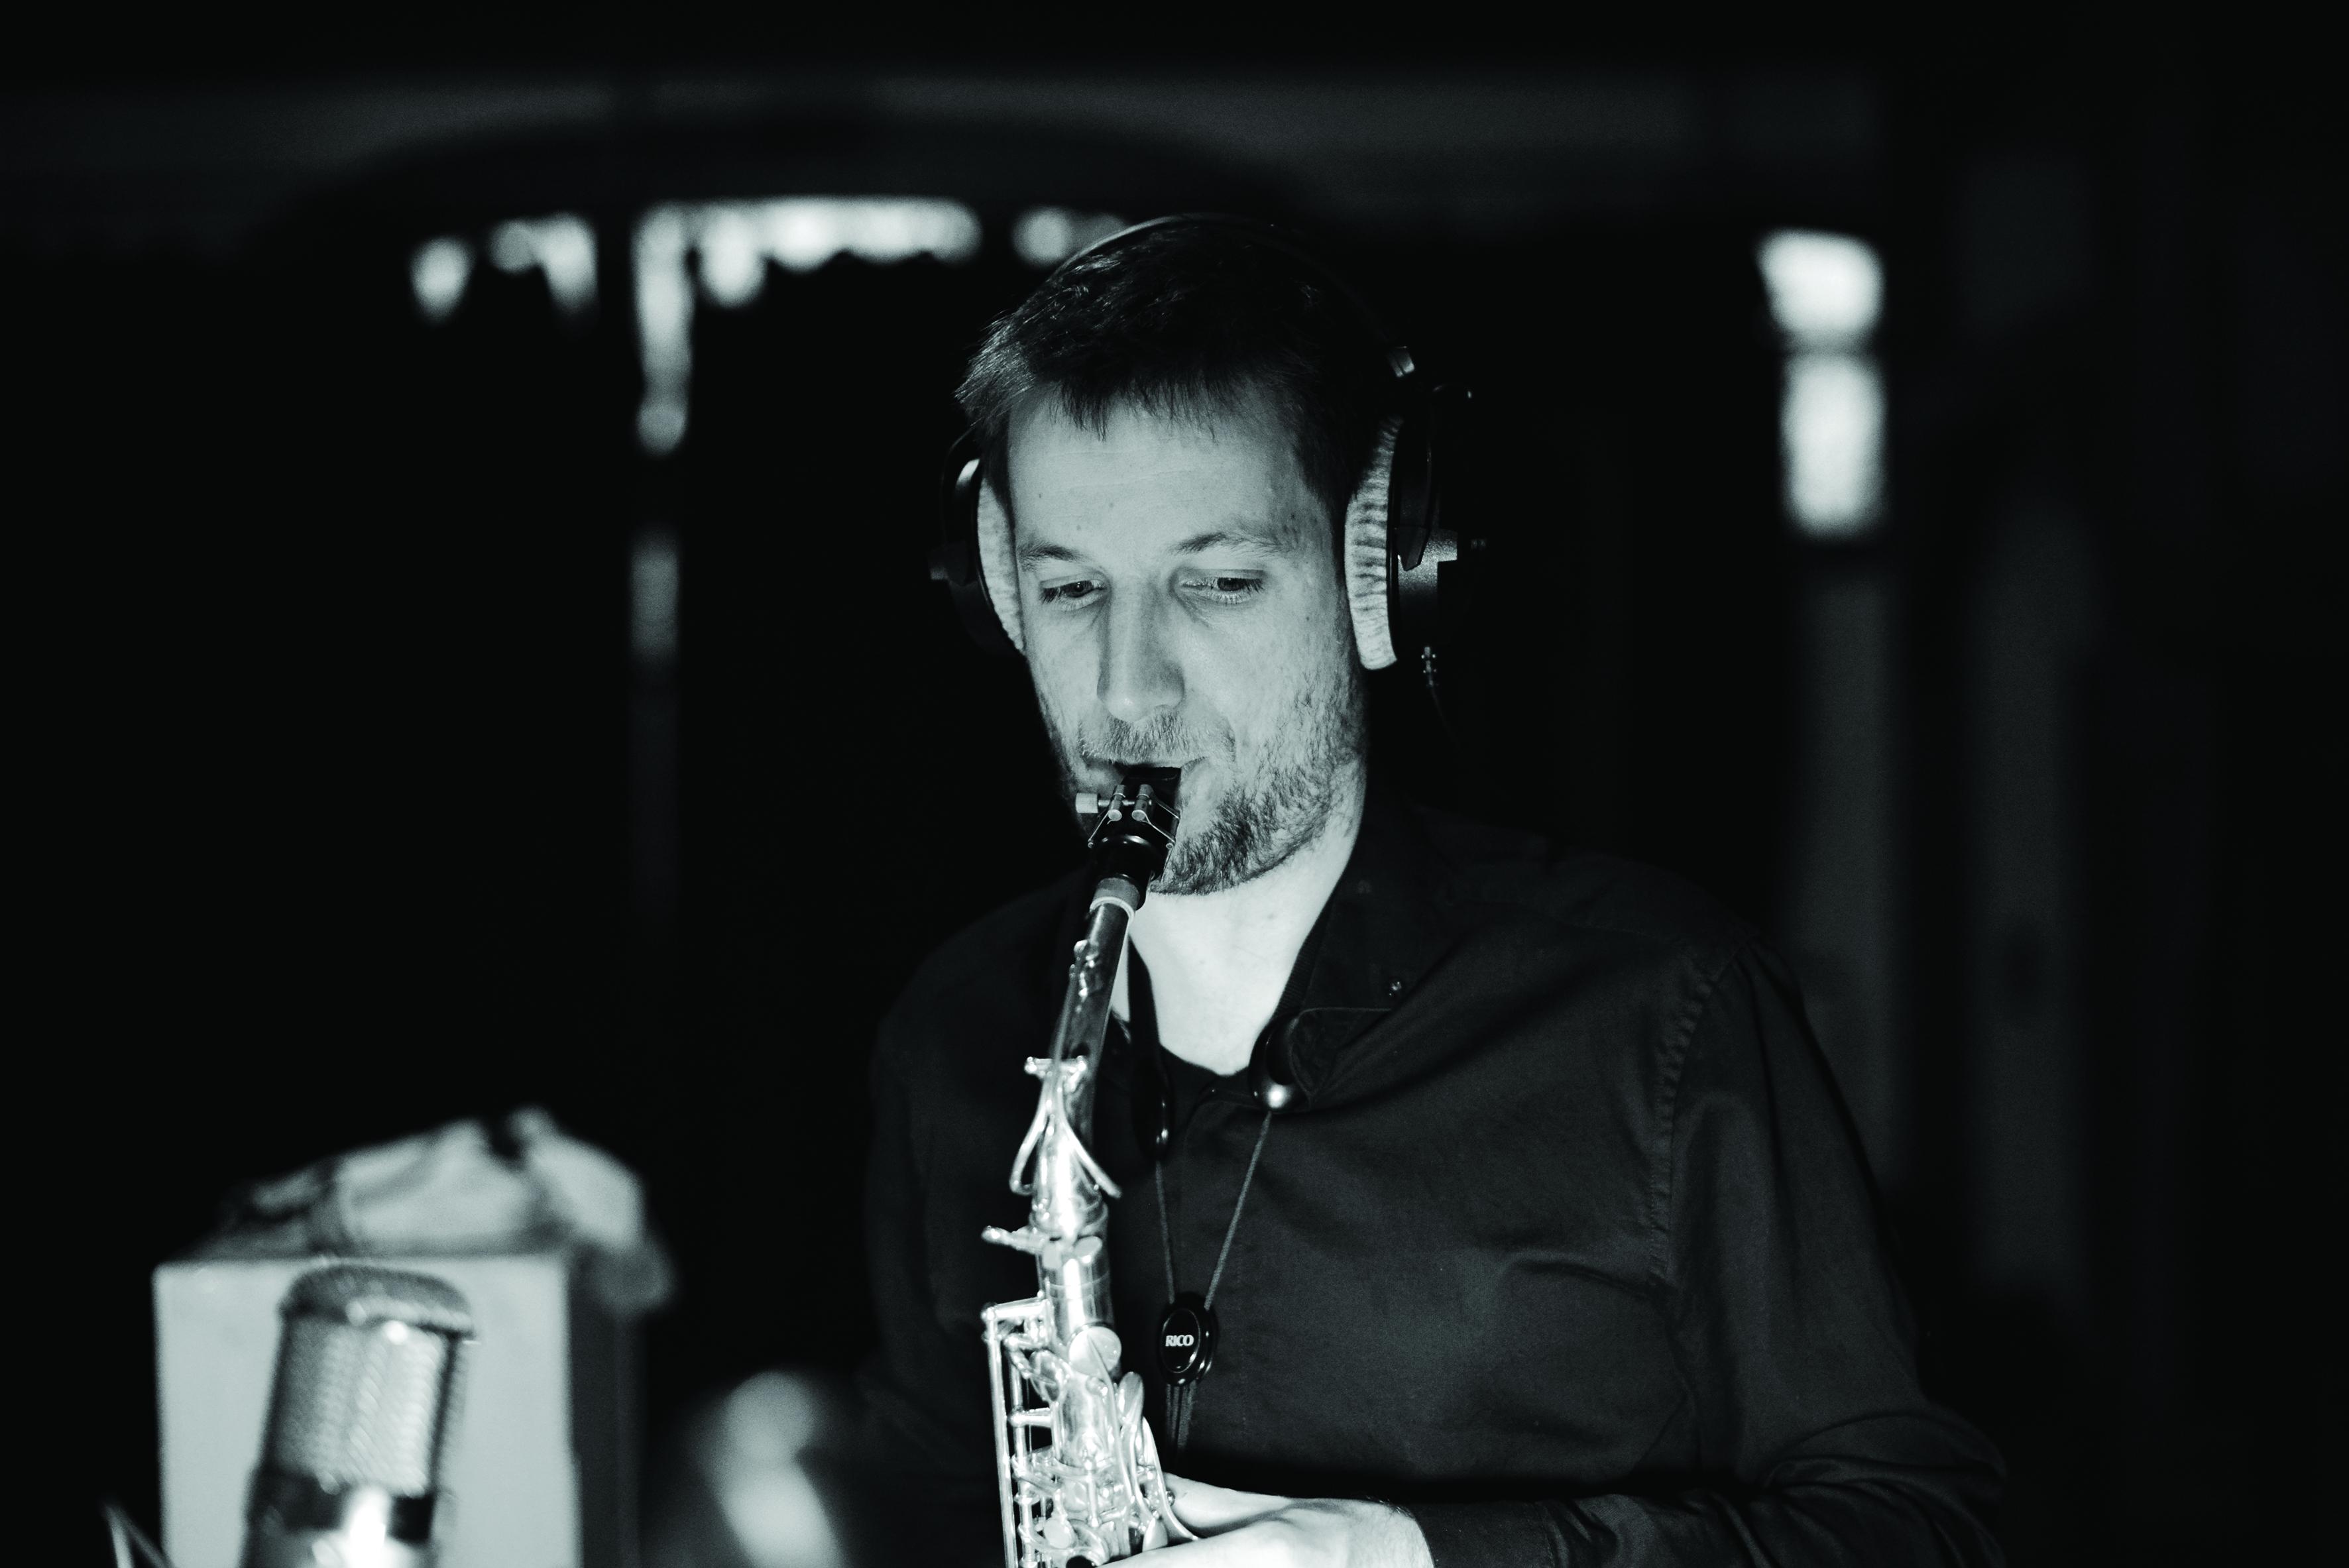 Tom Bourgeois